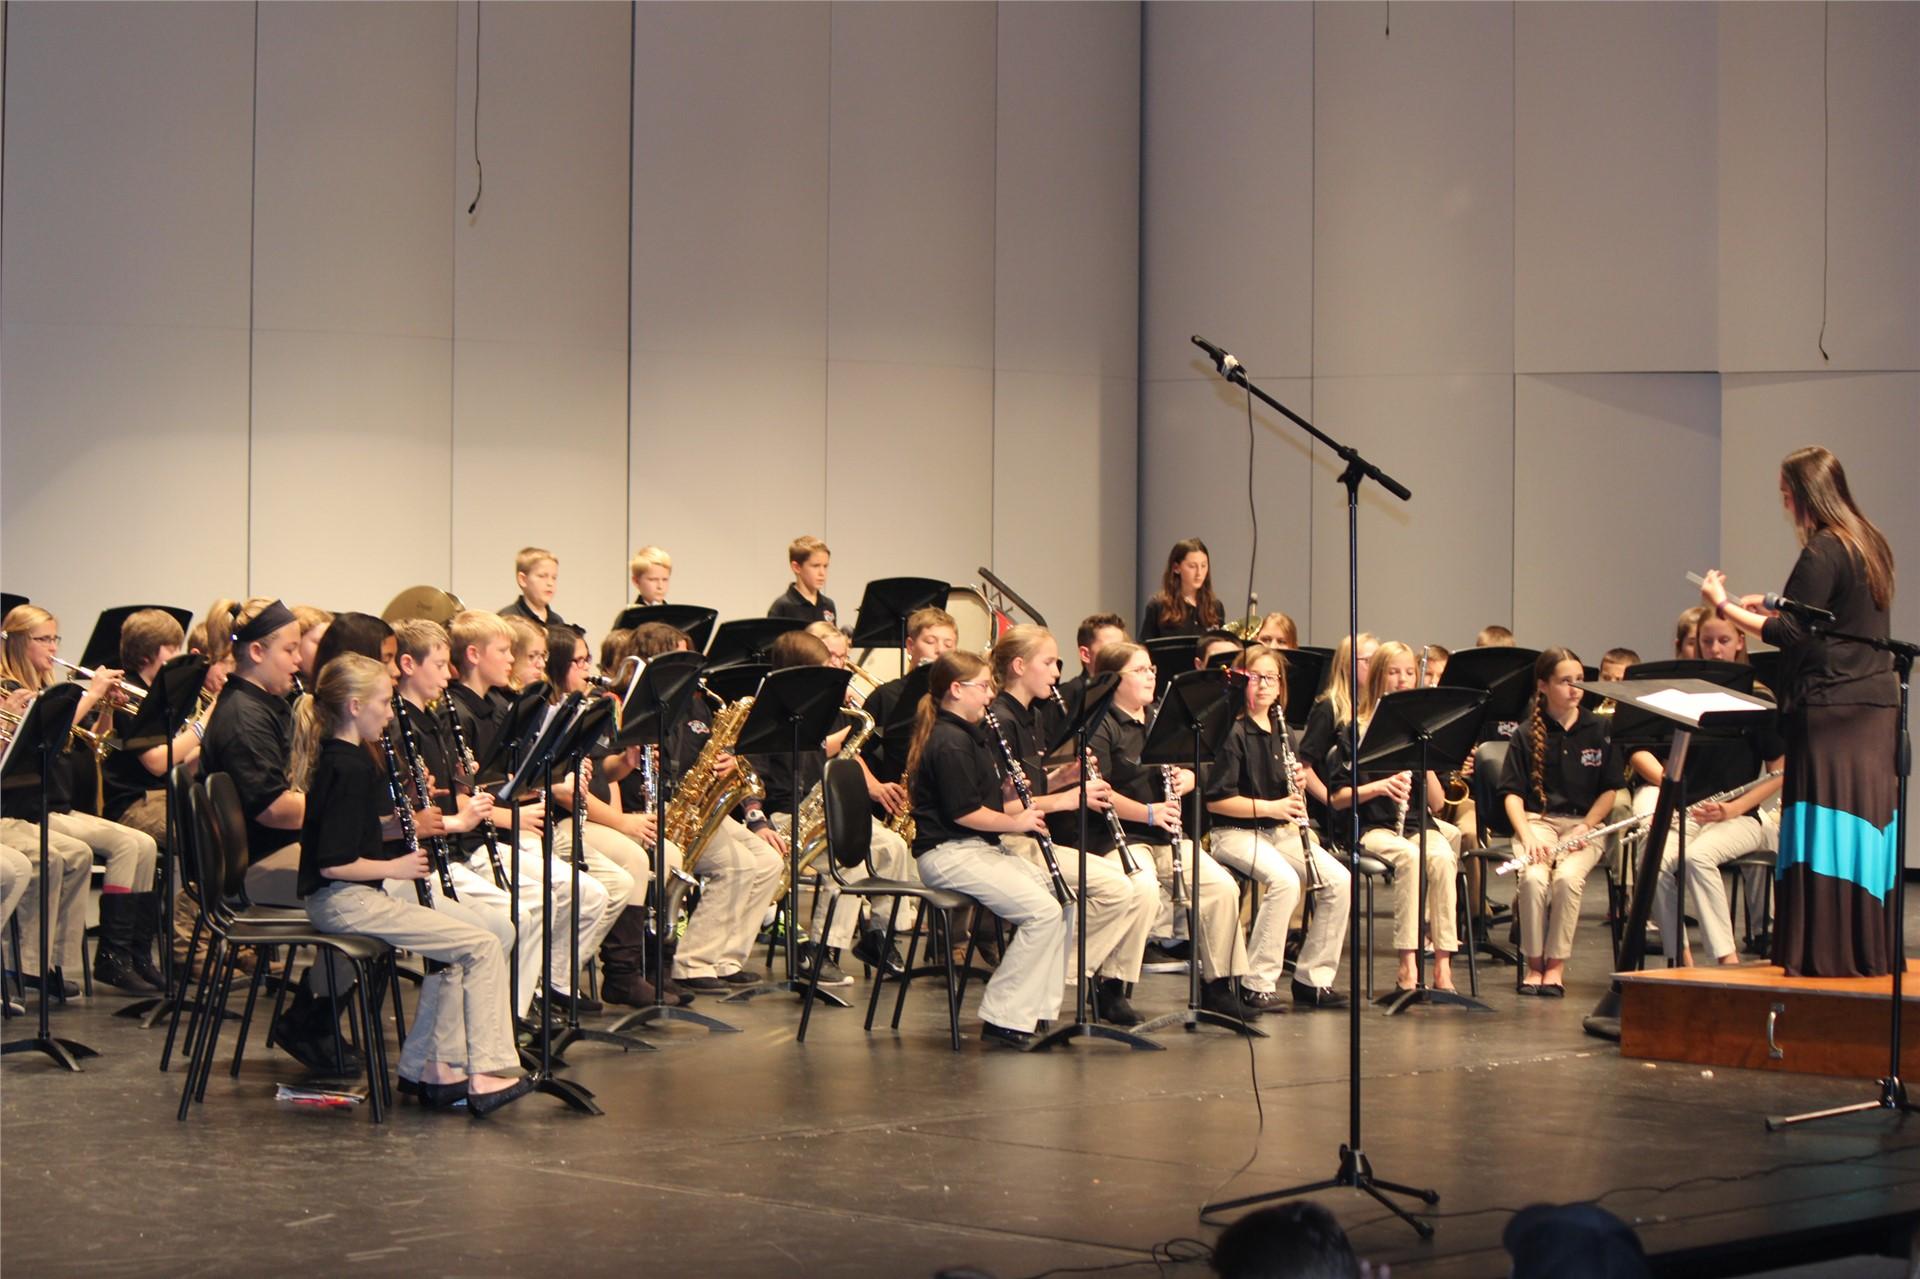 6th grade band, spring 2016